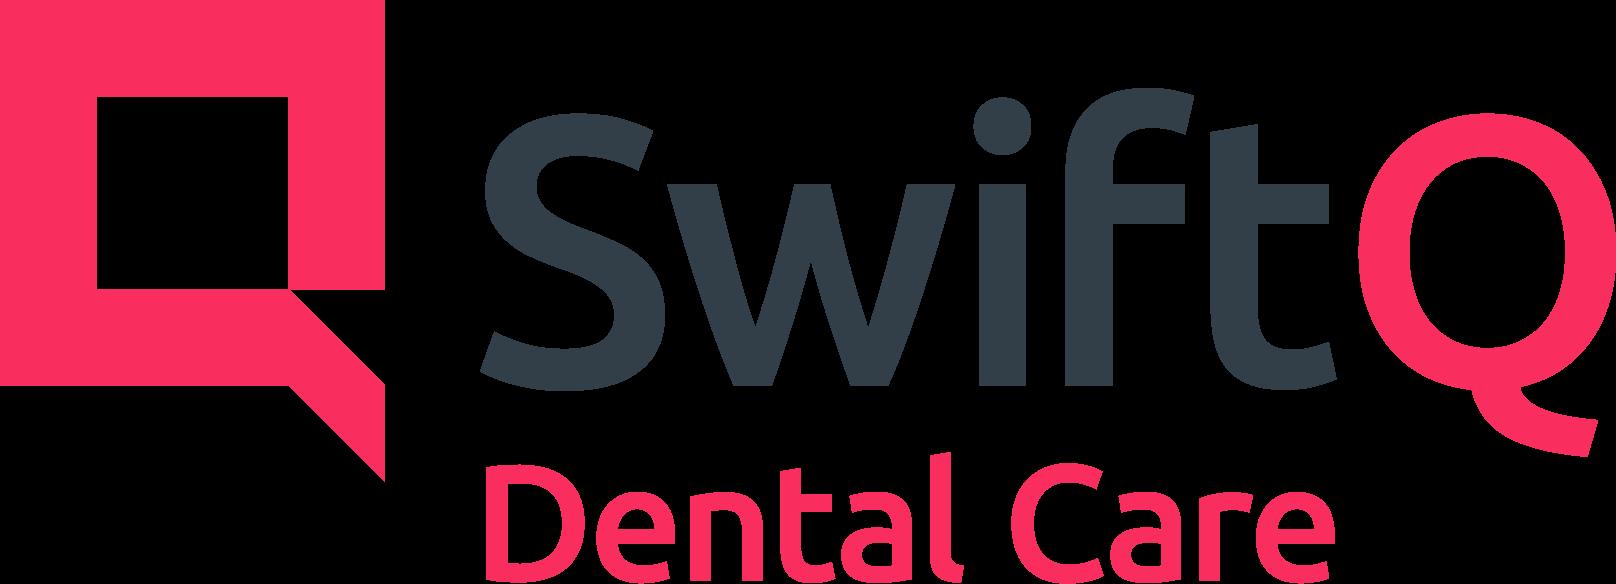 SwiftQ Dental Care - Fairfield Chase